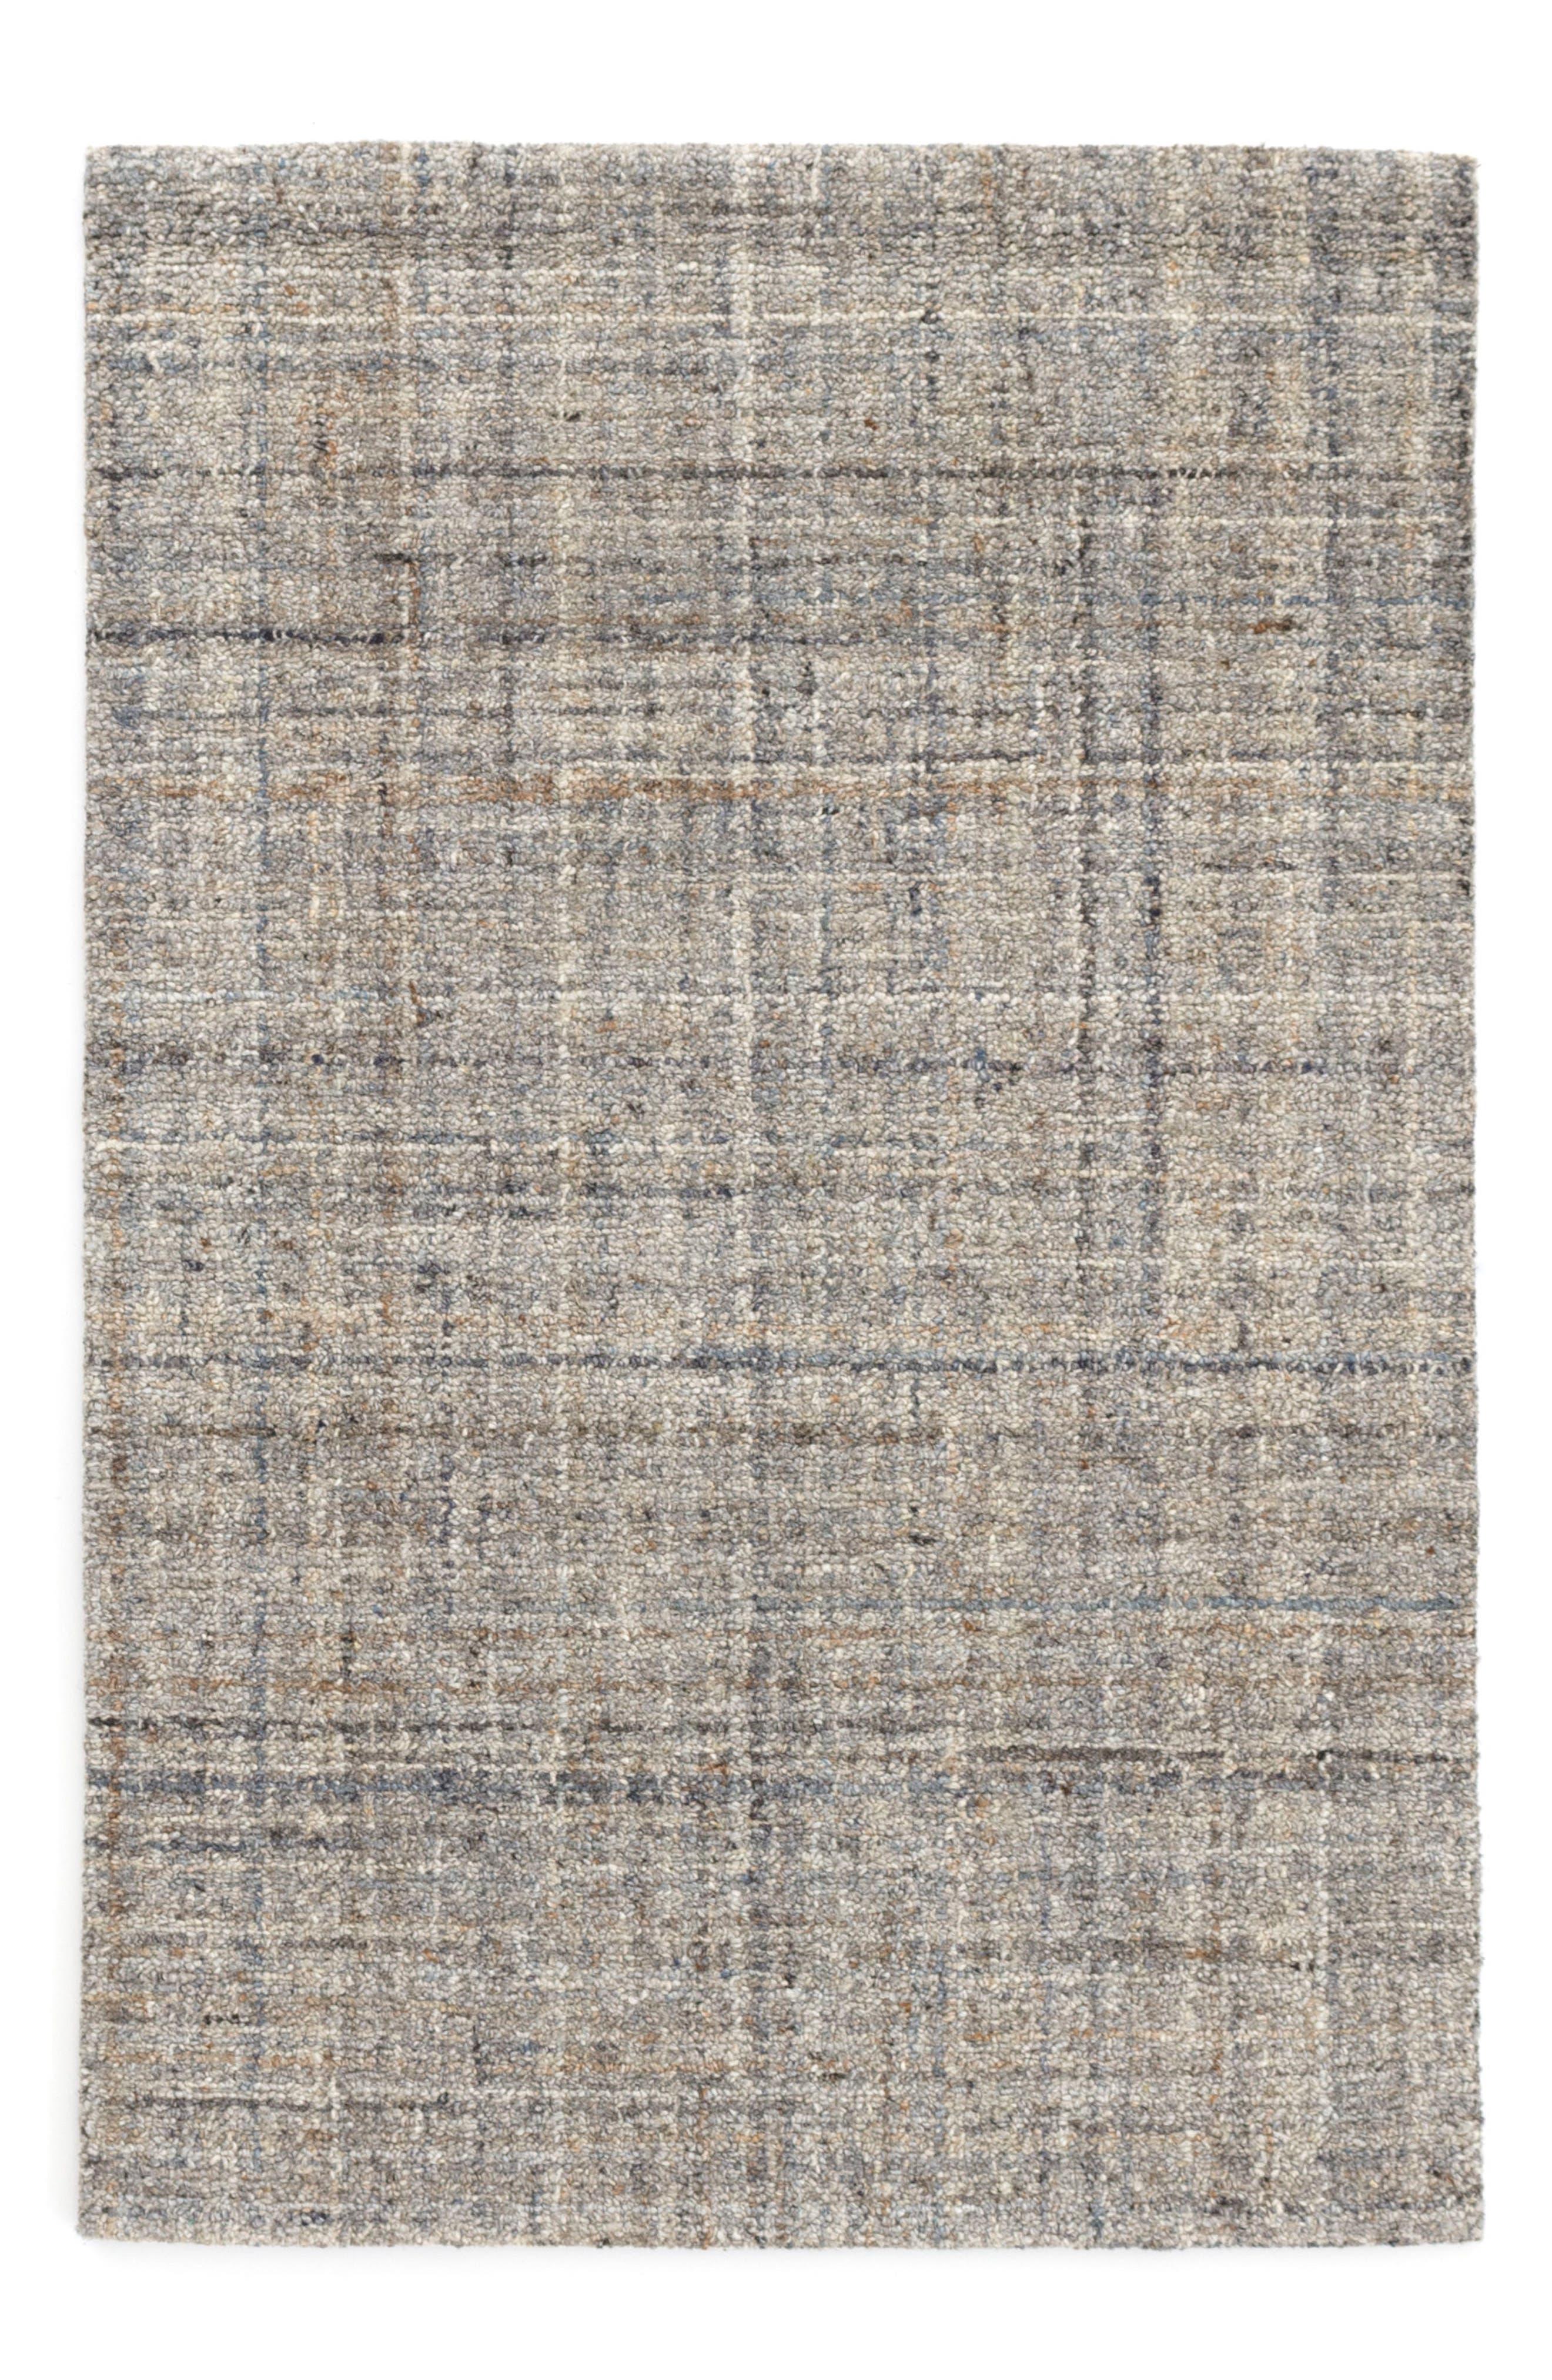 Harris Wool Rug,                             Main thumbnail 1, color,                             BLUE